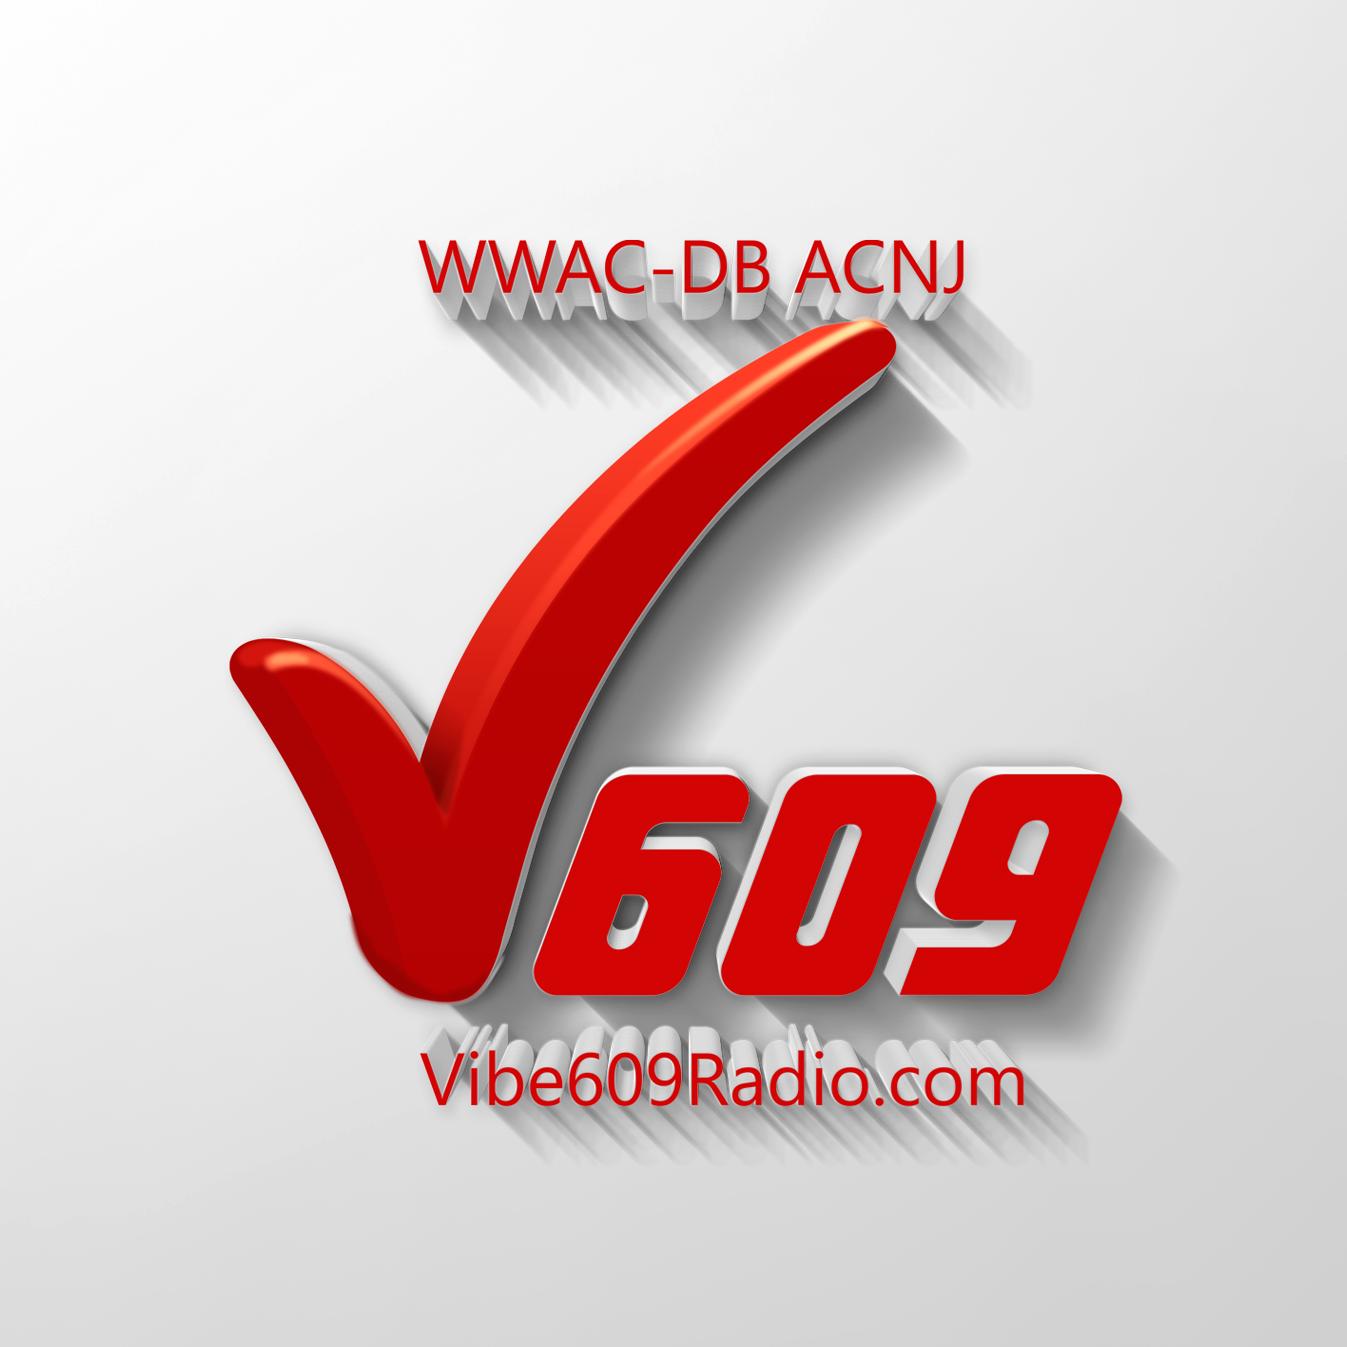 WWAC-DB ATLANTIC CITY VIBE609 RADIO